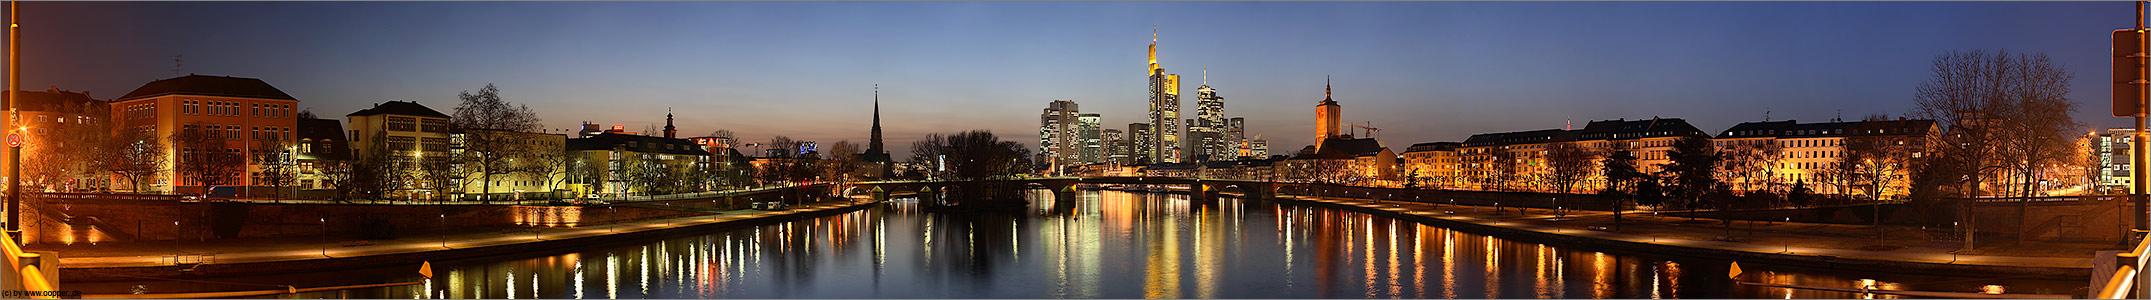 Frankfurter Innenstadt Panorama 180° - Remake